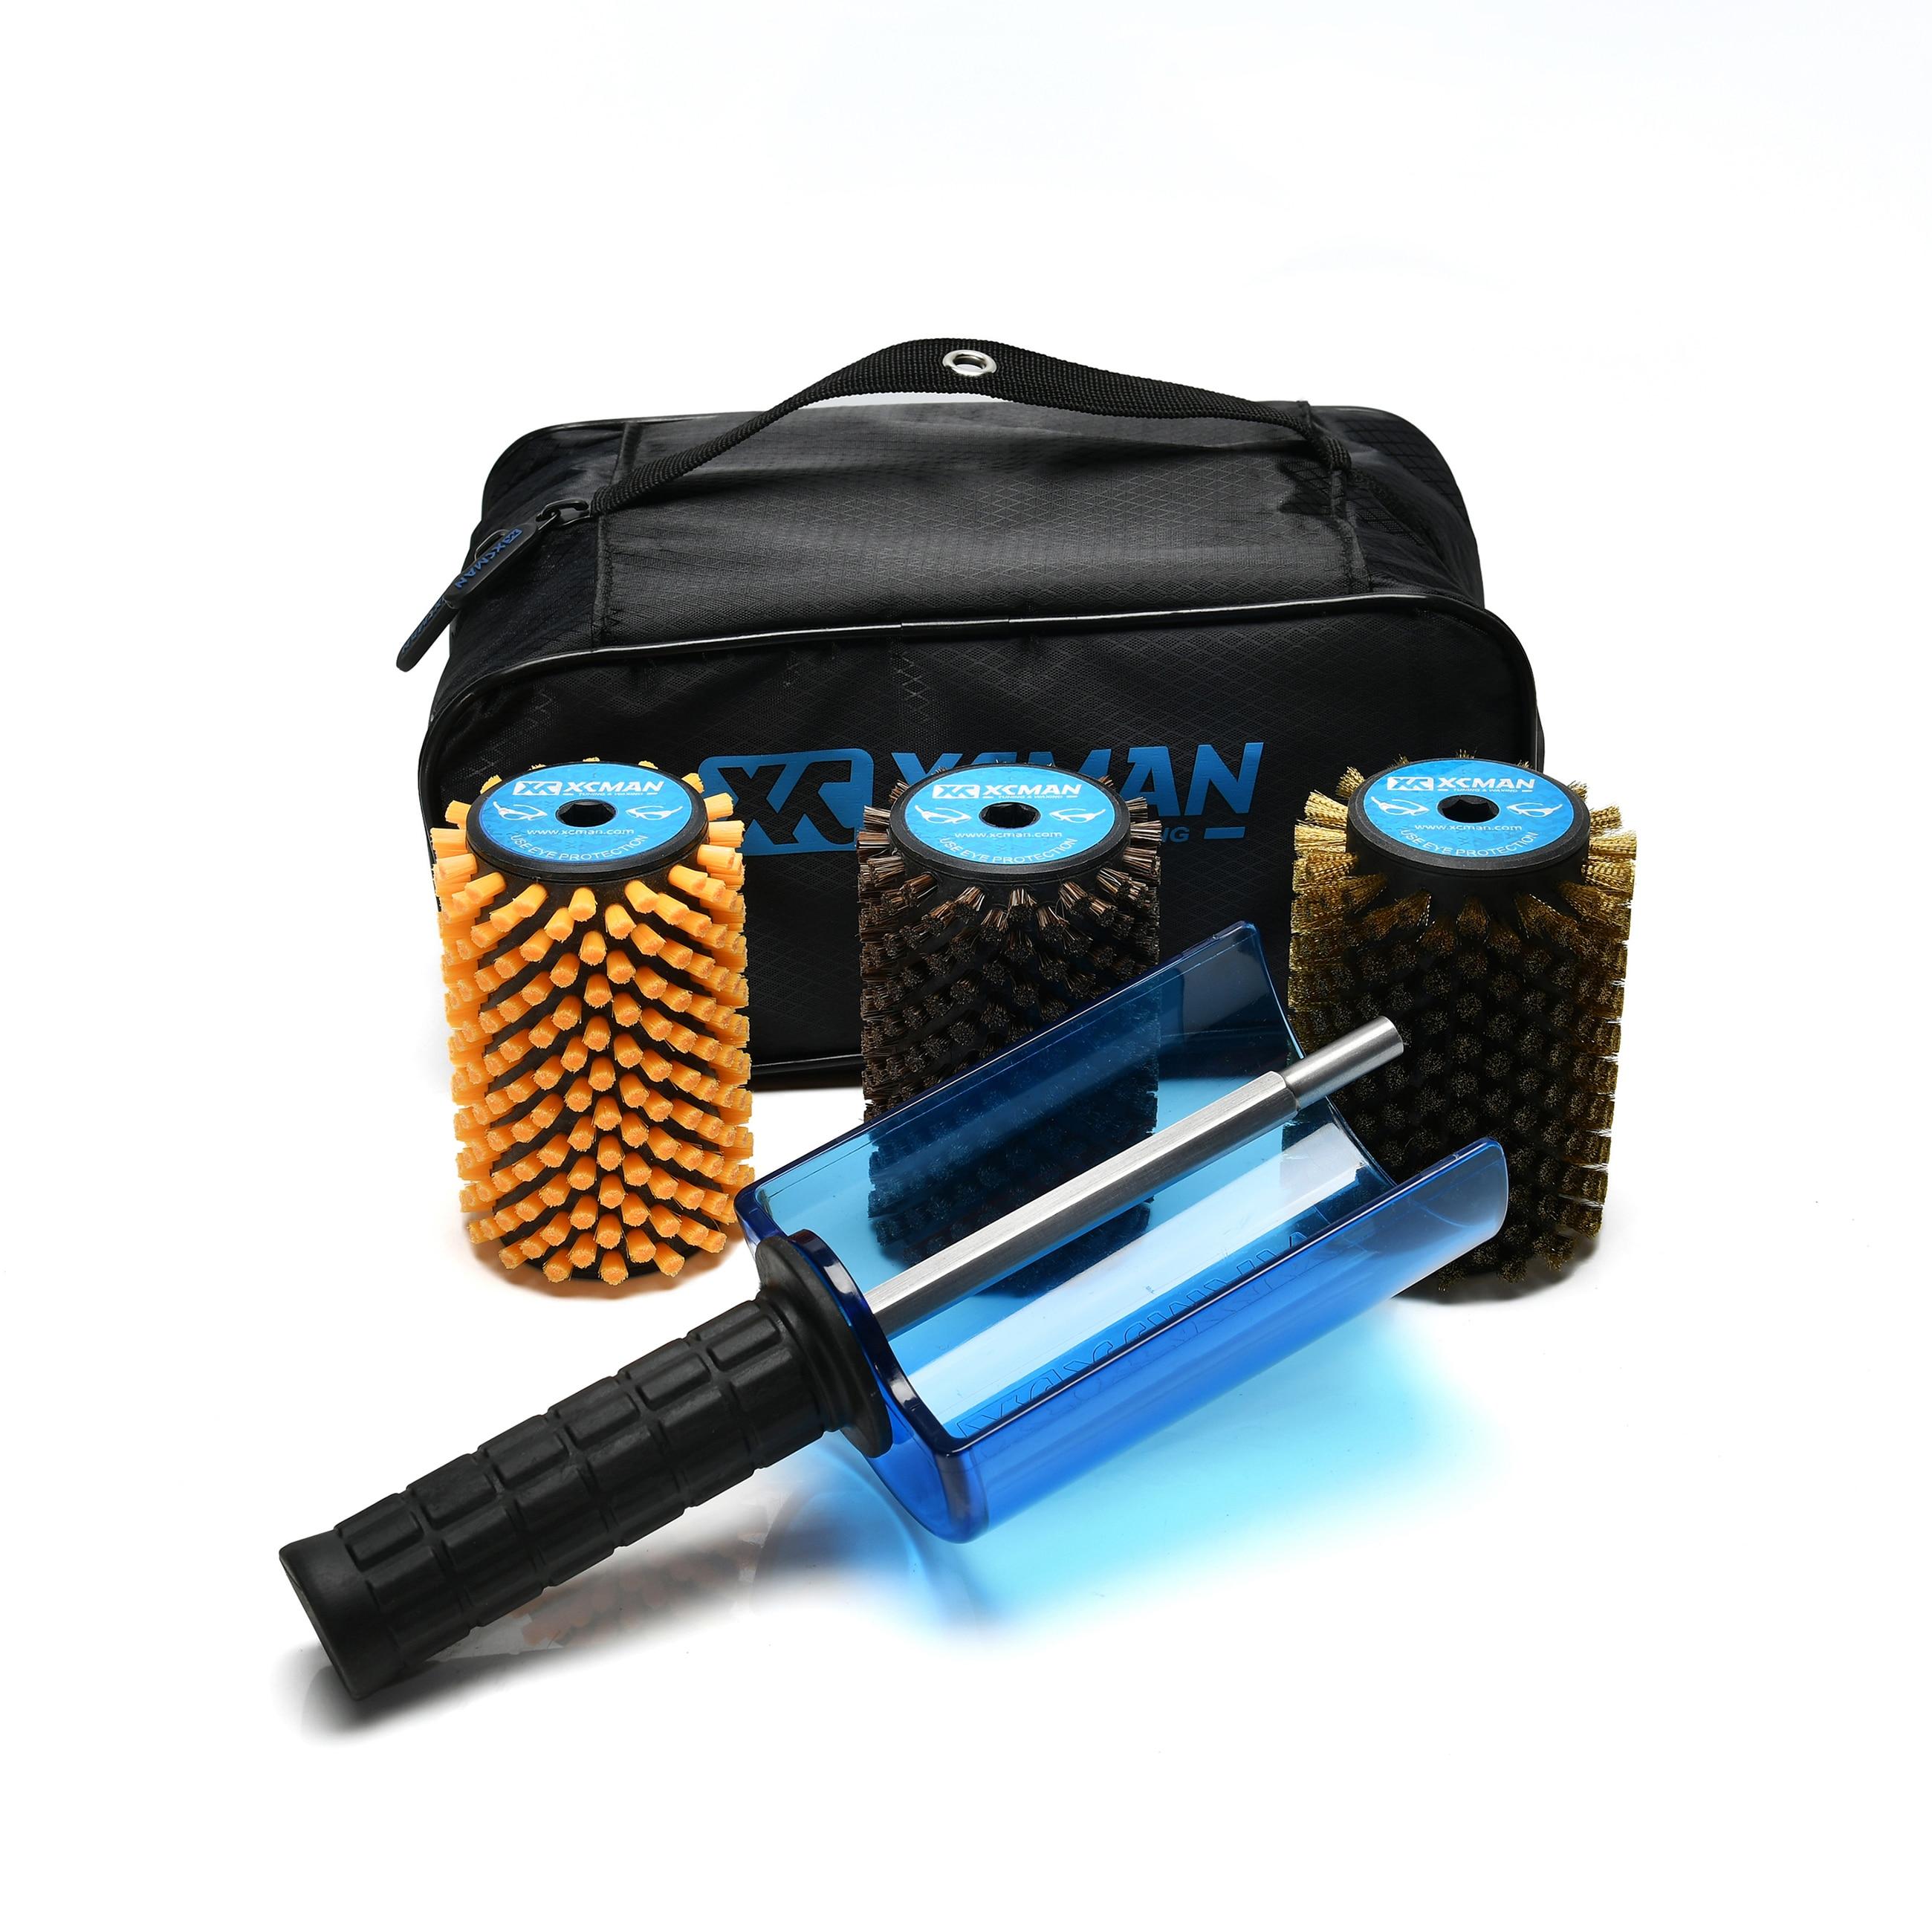 XCMAN Ski Roto Brush Kit Roto Brush Controller Handle  With All 3 Brushes: Nylon, Horsehair, Brass/Cork